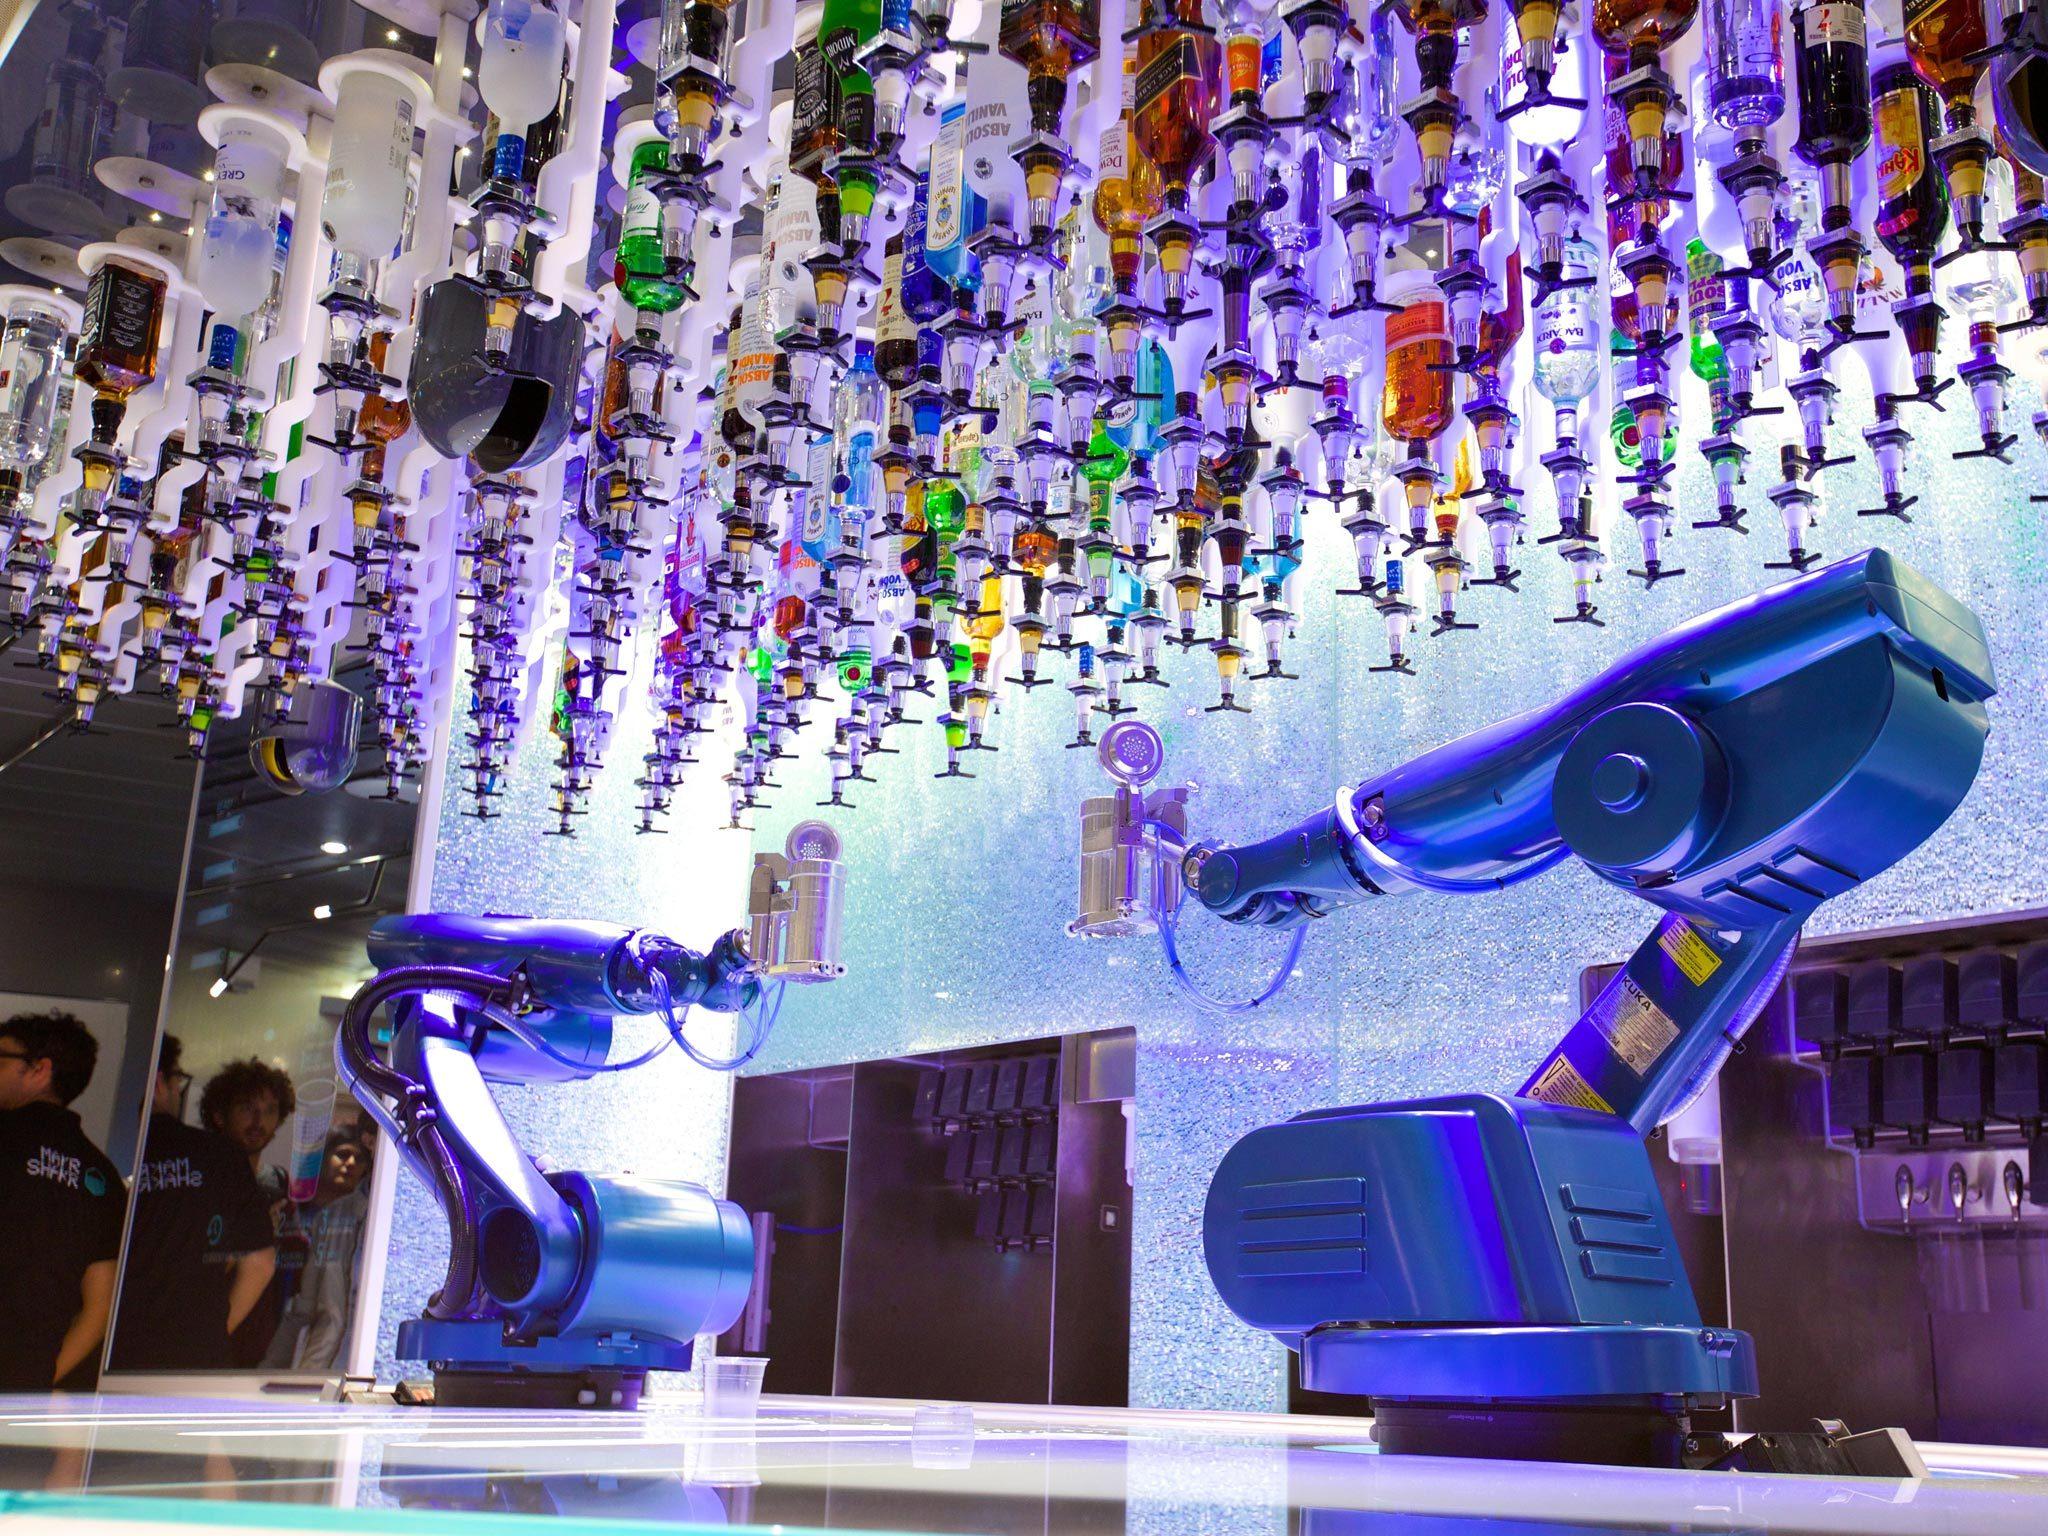 The Tipsy Robot, Las Vegas